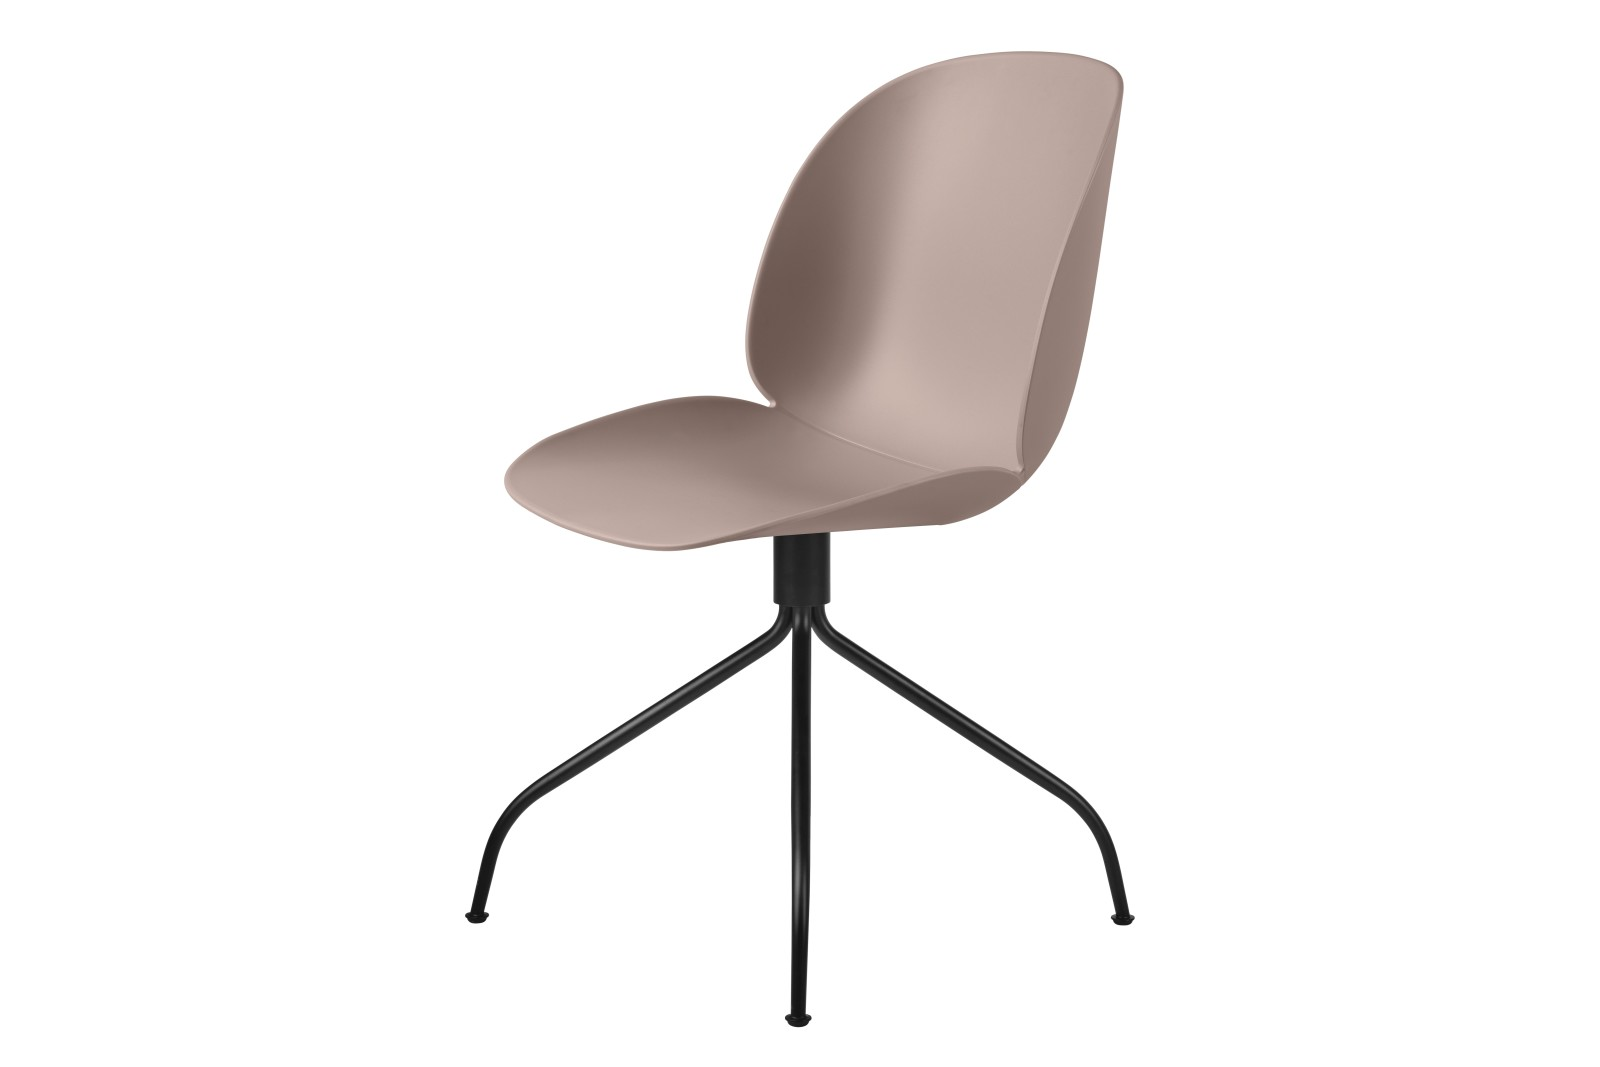 Beetle Un-Upholstered Swivel Meeting Chair Gubi Metal Matt Black, Plastic Sweet Pink, Plastic Glides